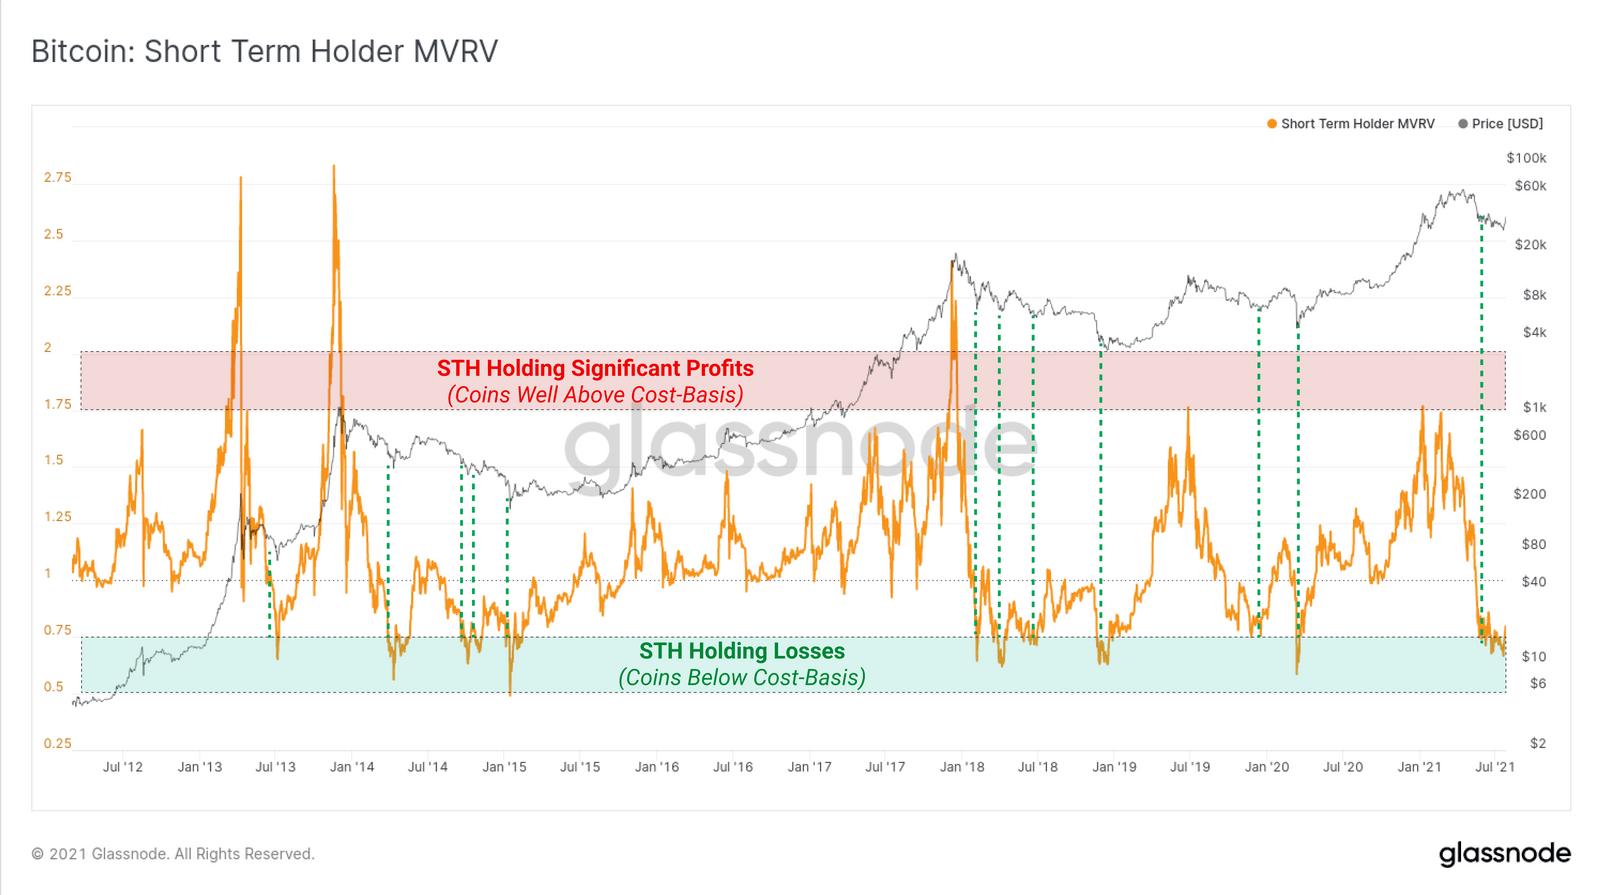 MVRV Ratio angepasst auf Kurzzeitinvestoren